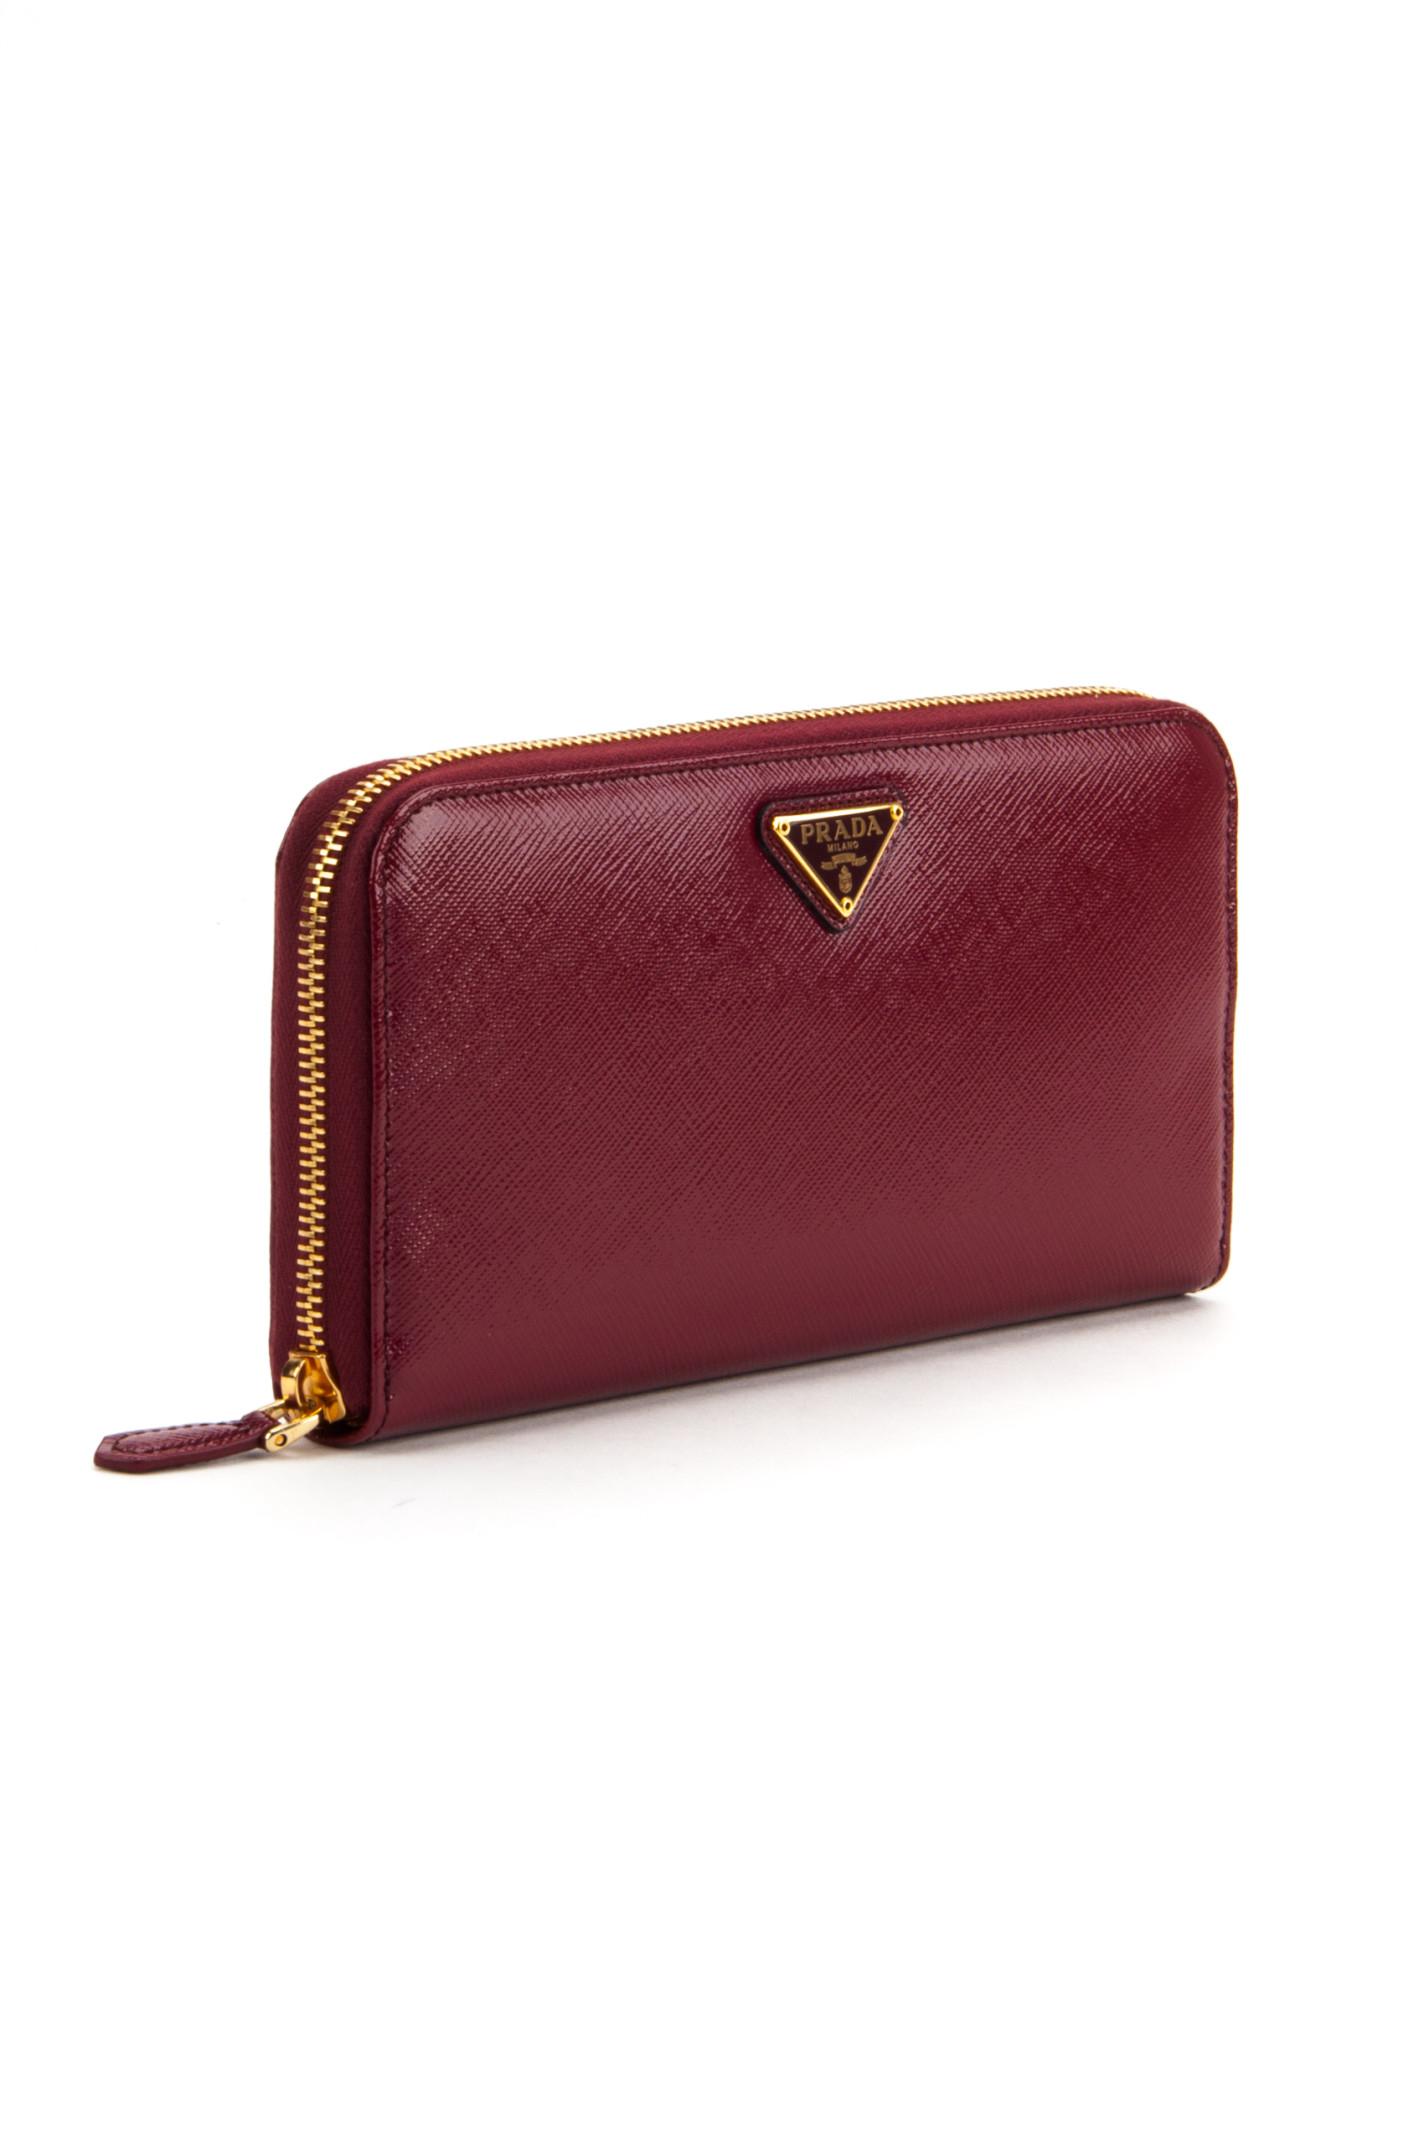 Prada Patent Saffiano Wallet in Purple (CERISE N) | Lyst